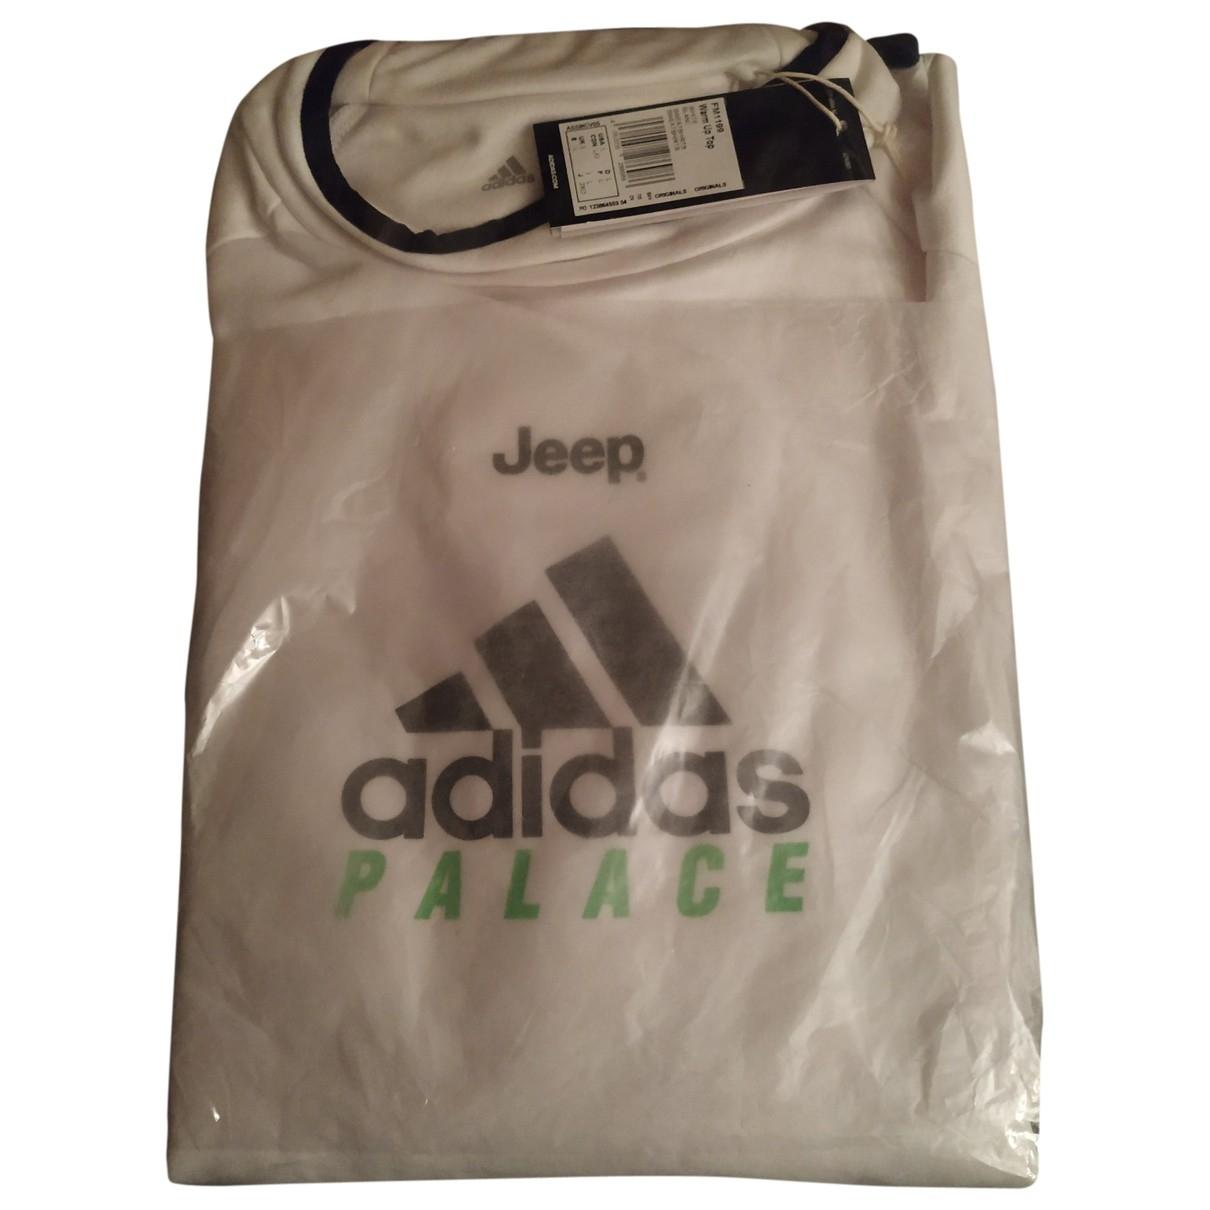 Palace X Adidas - Tee shirts   pour homme en coton - blanc